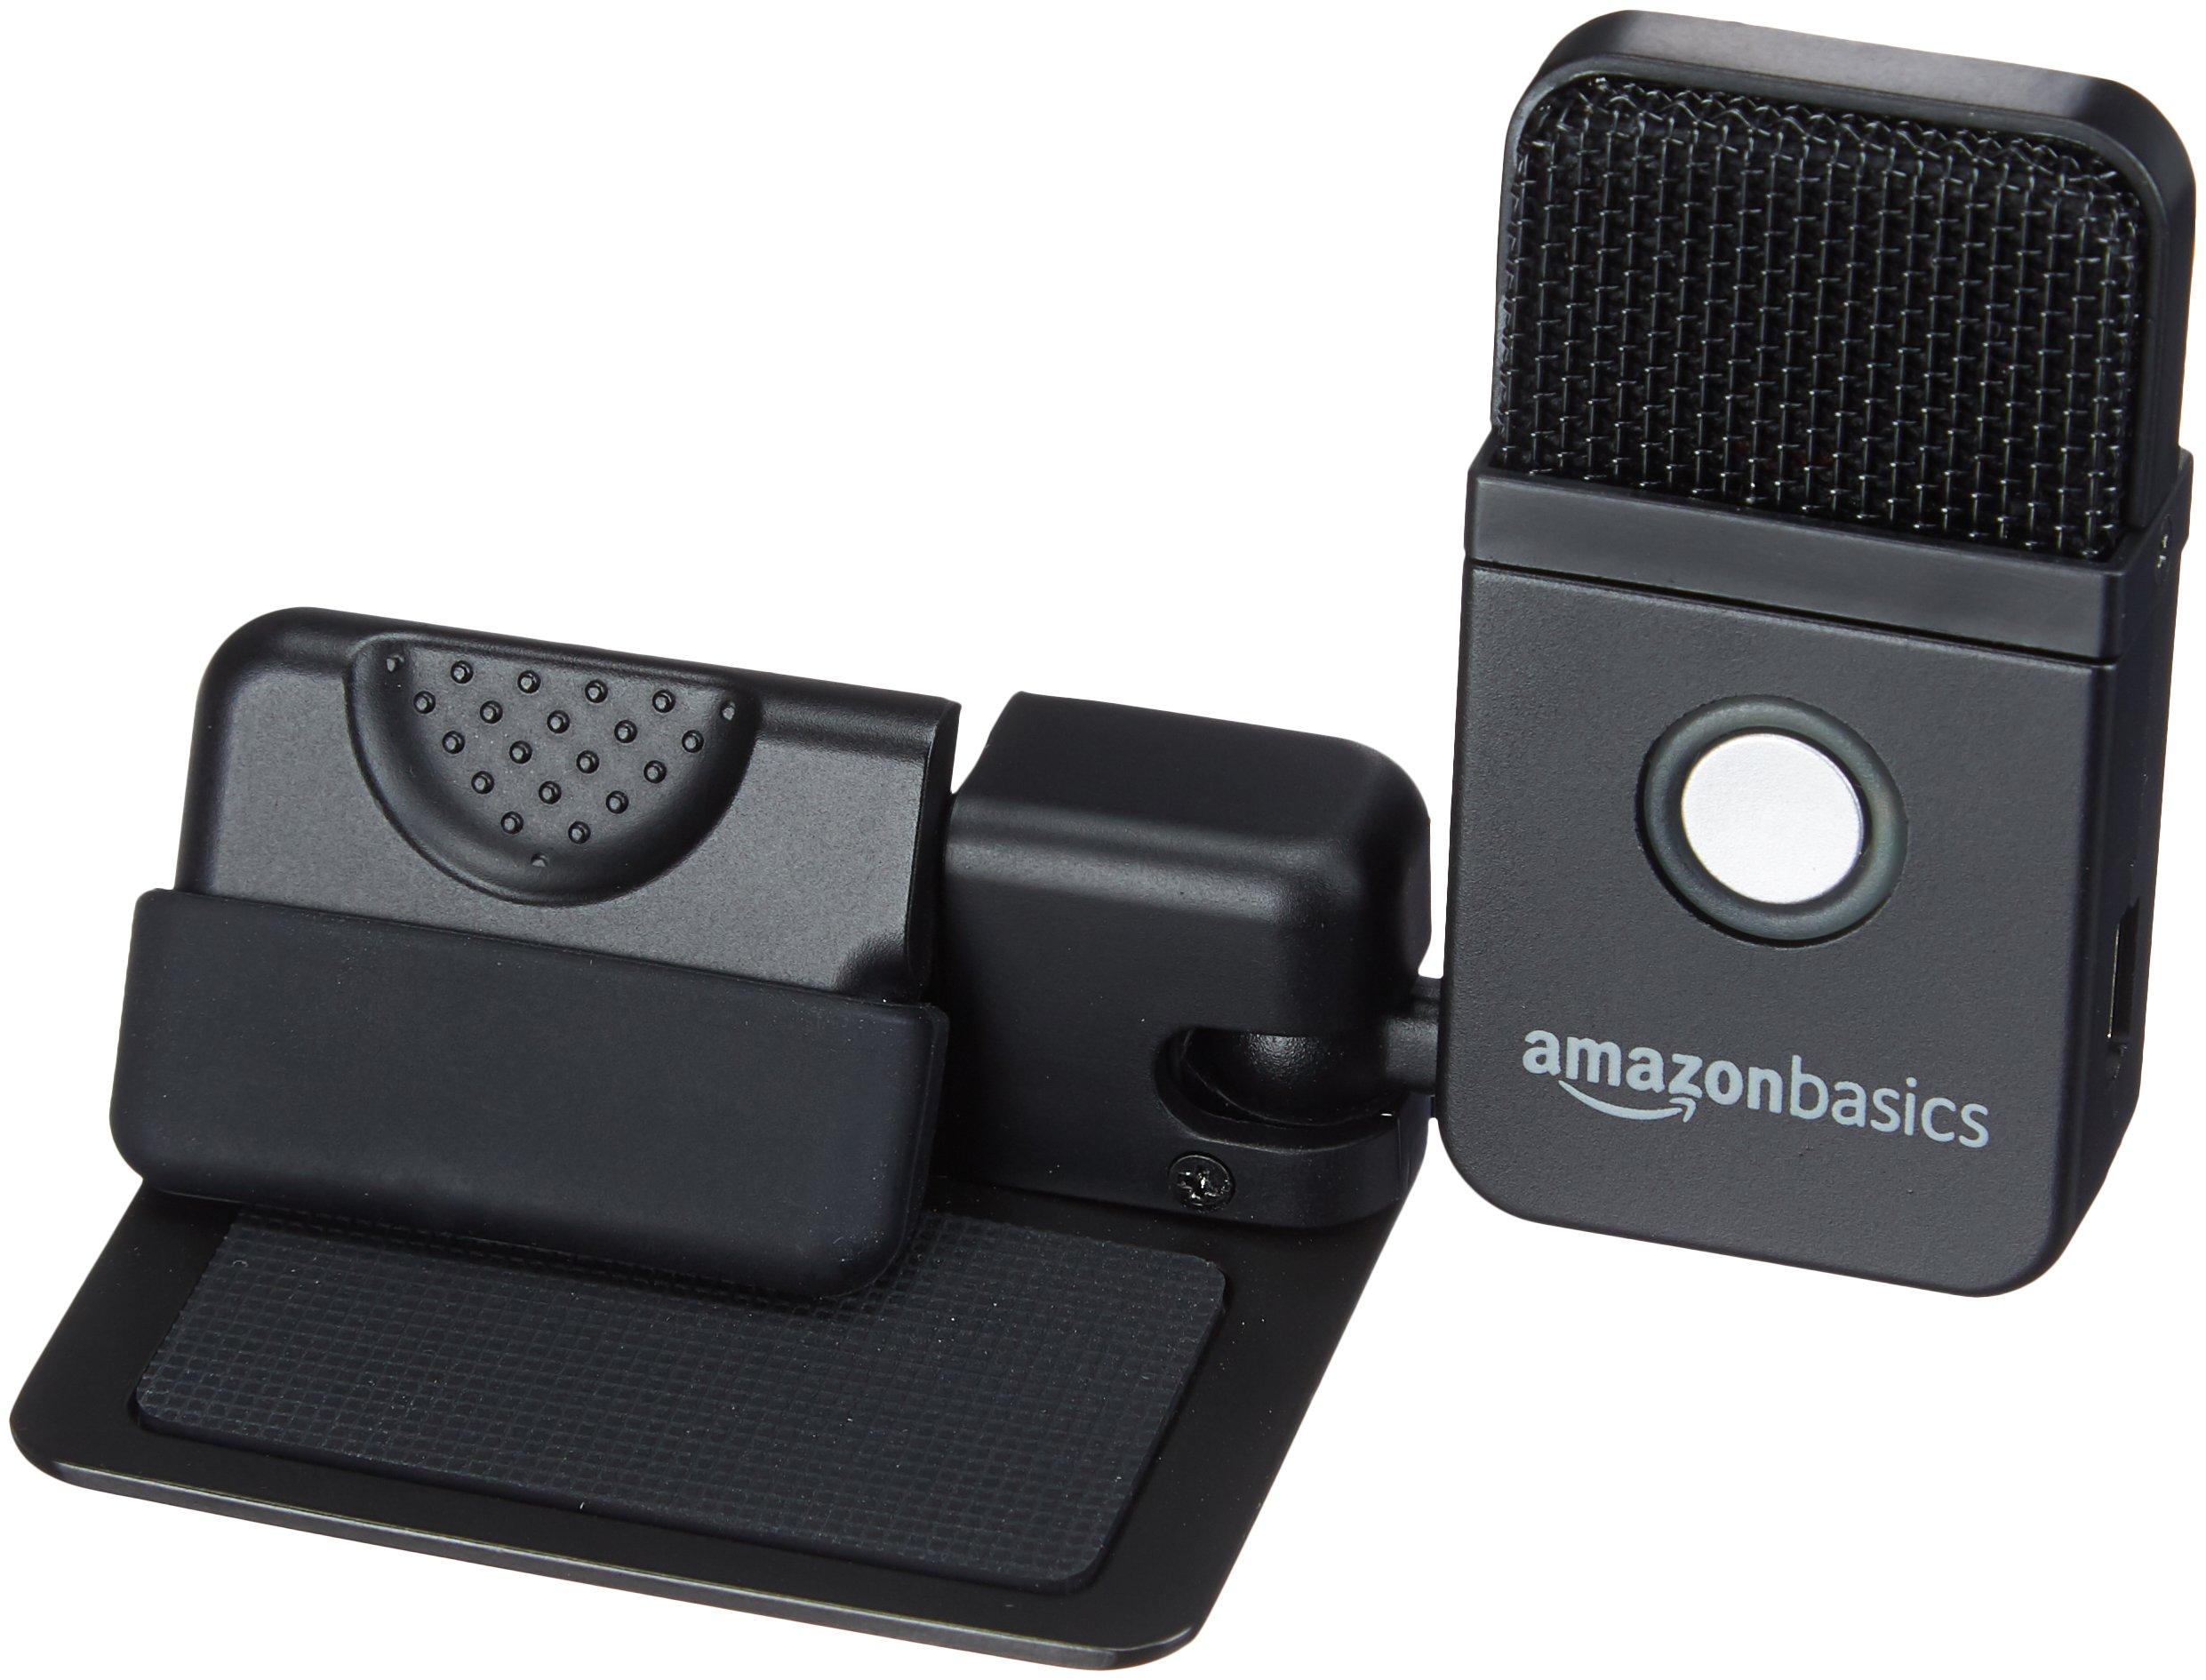 AmazonBasics Portable USB Condenser Microphone by AmazonBasics